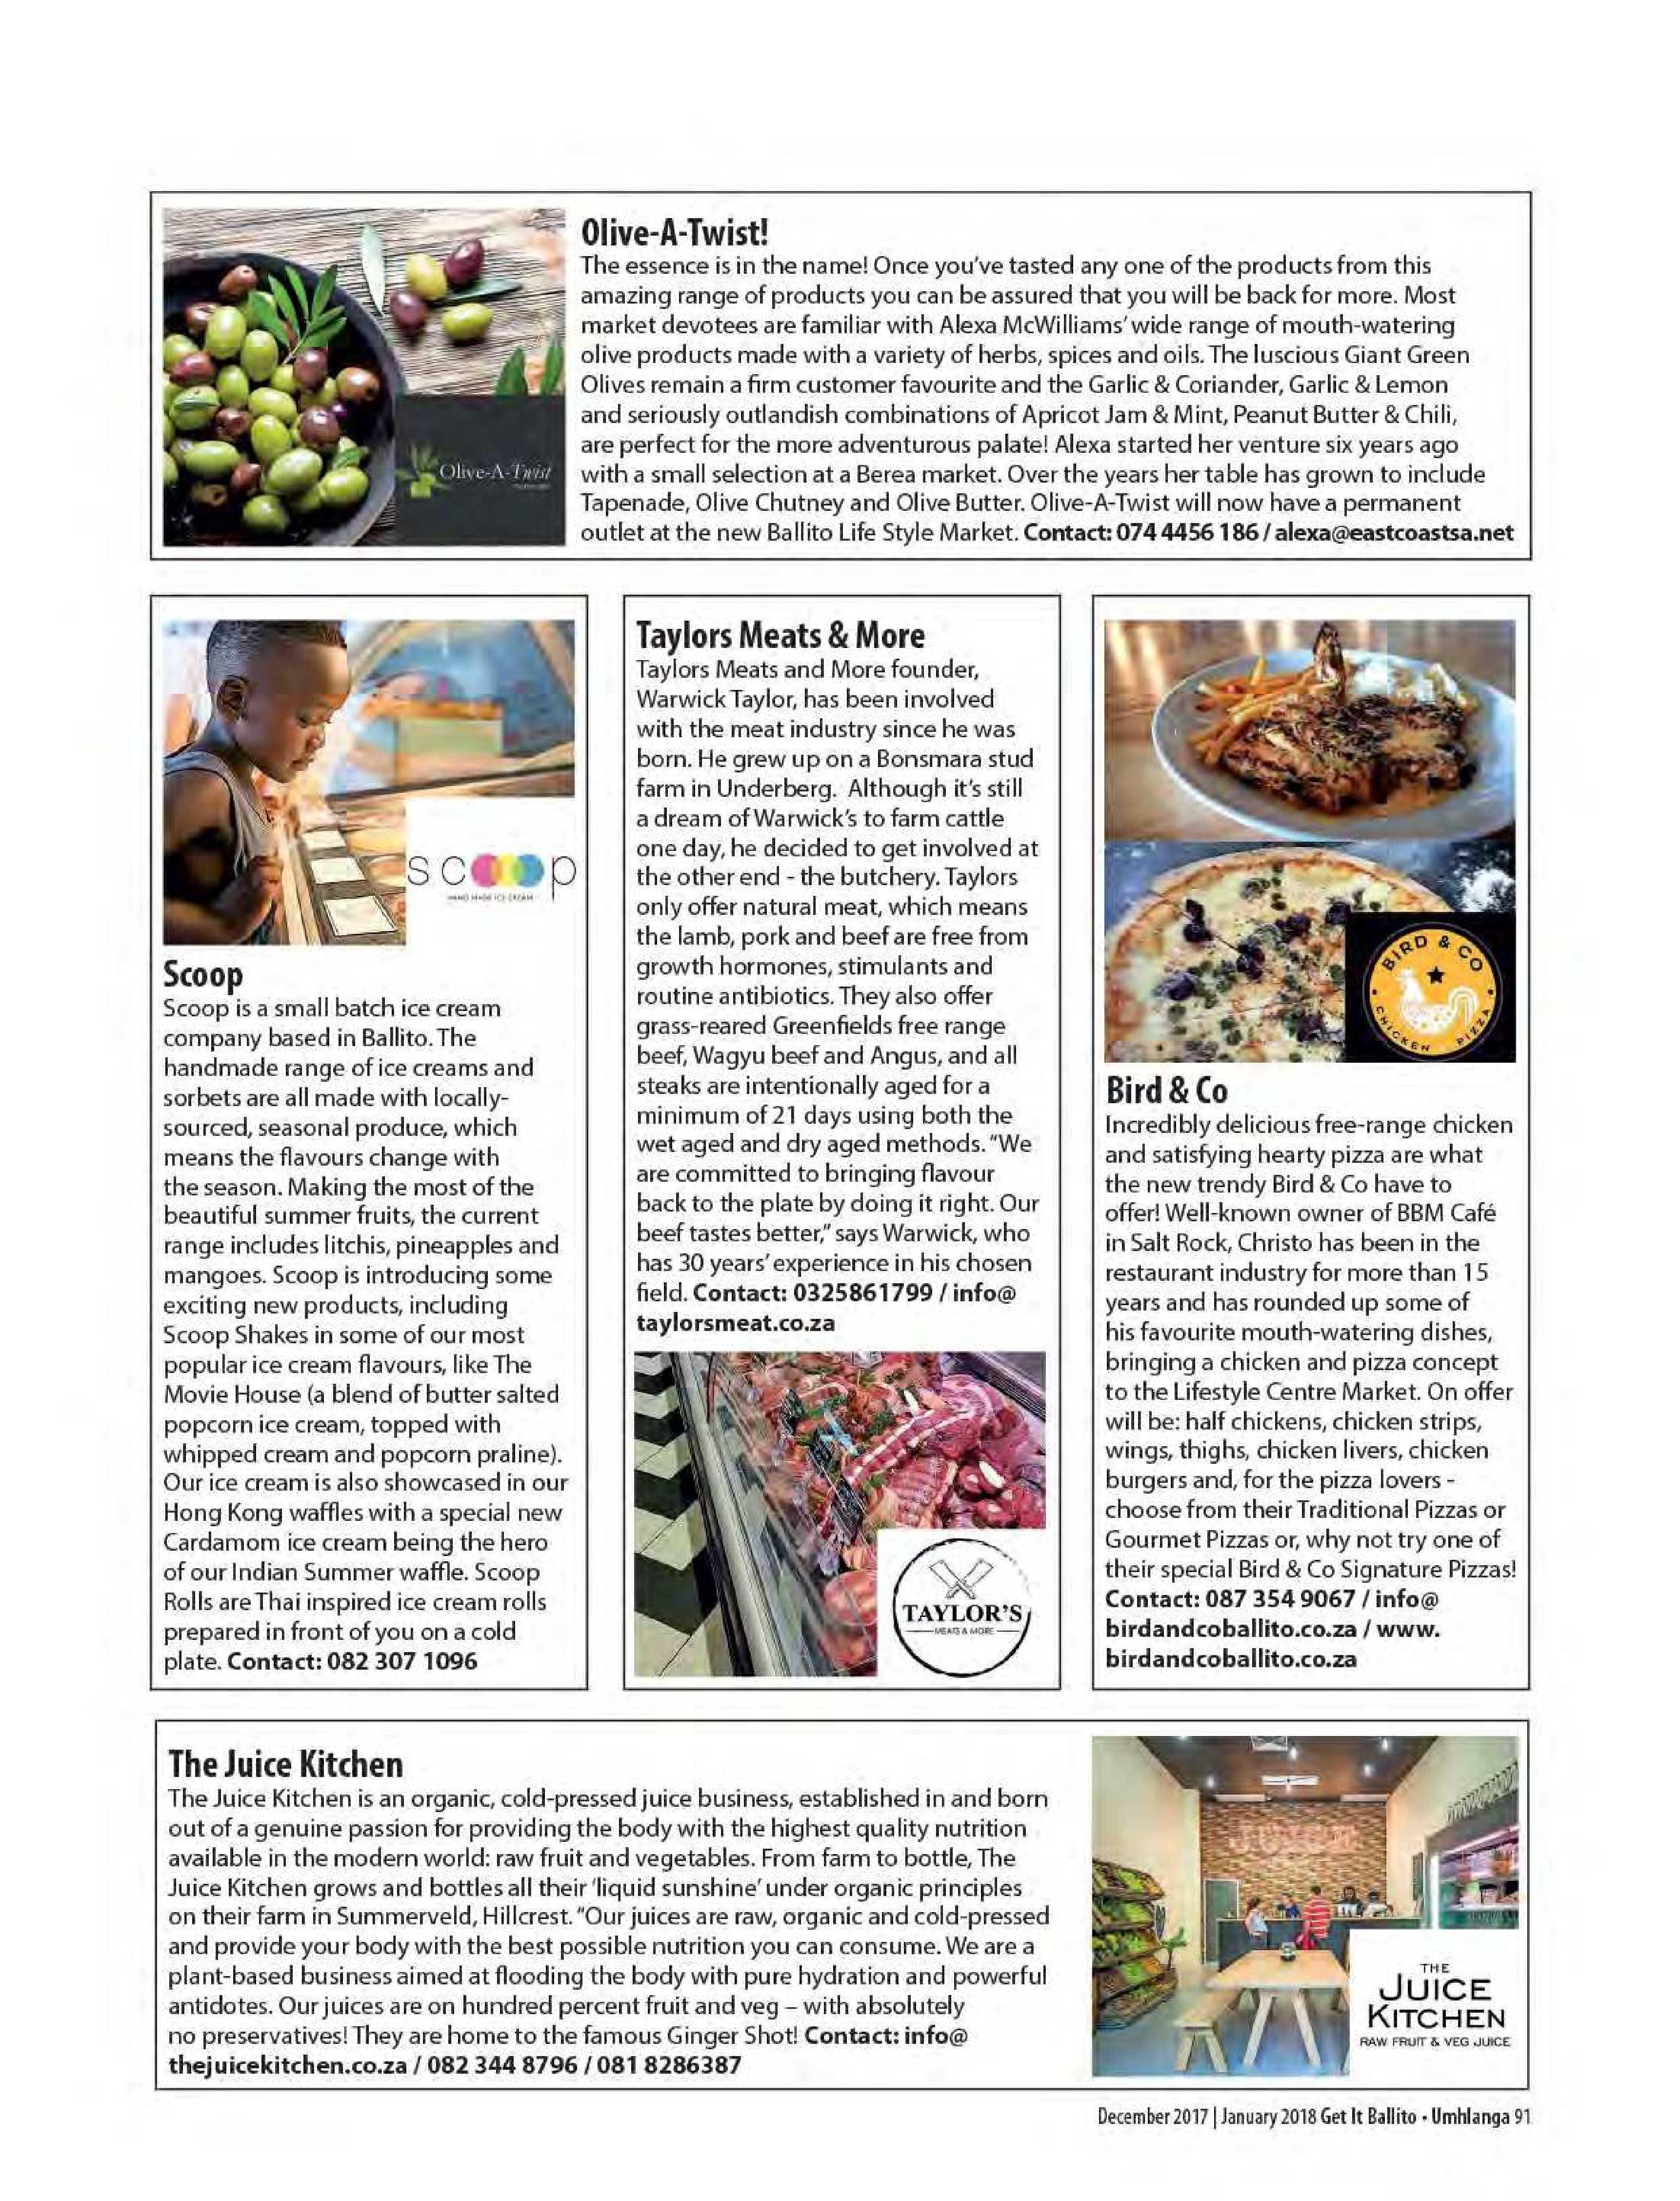 get-magazine-ballitoumhlanga-december-2017-january-2018-2-epapers-page-93